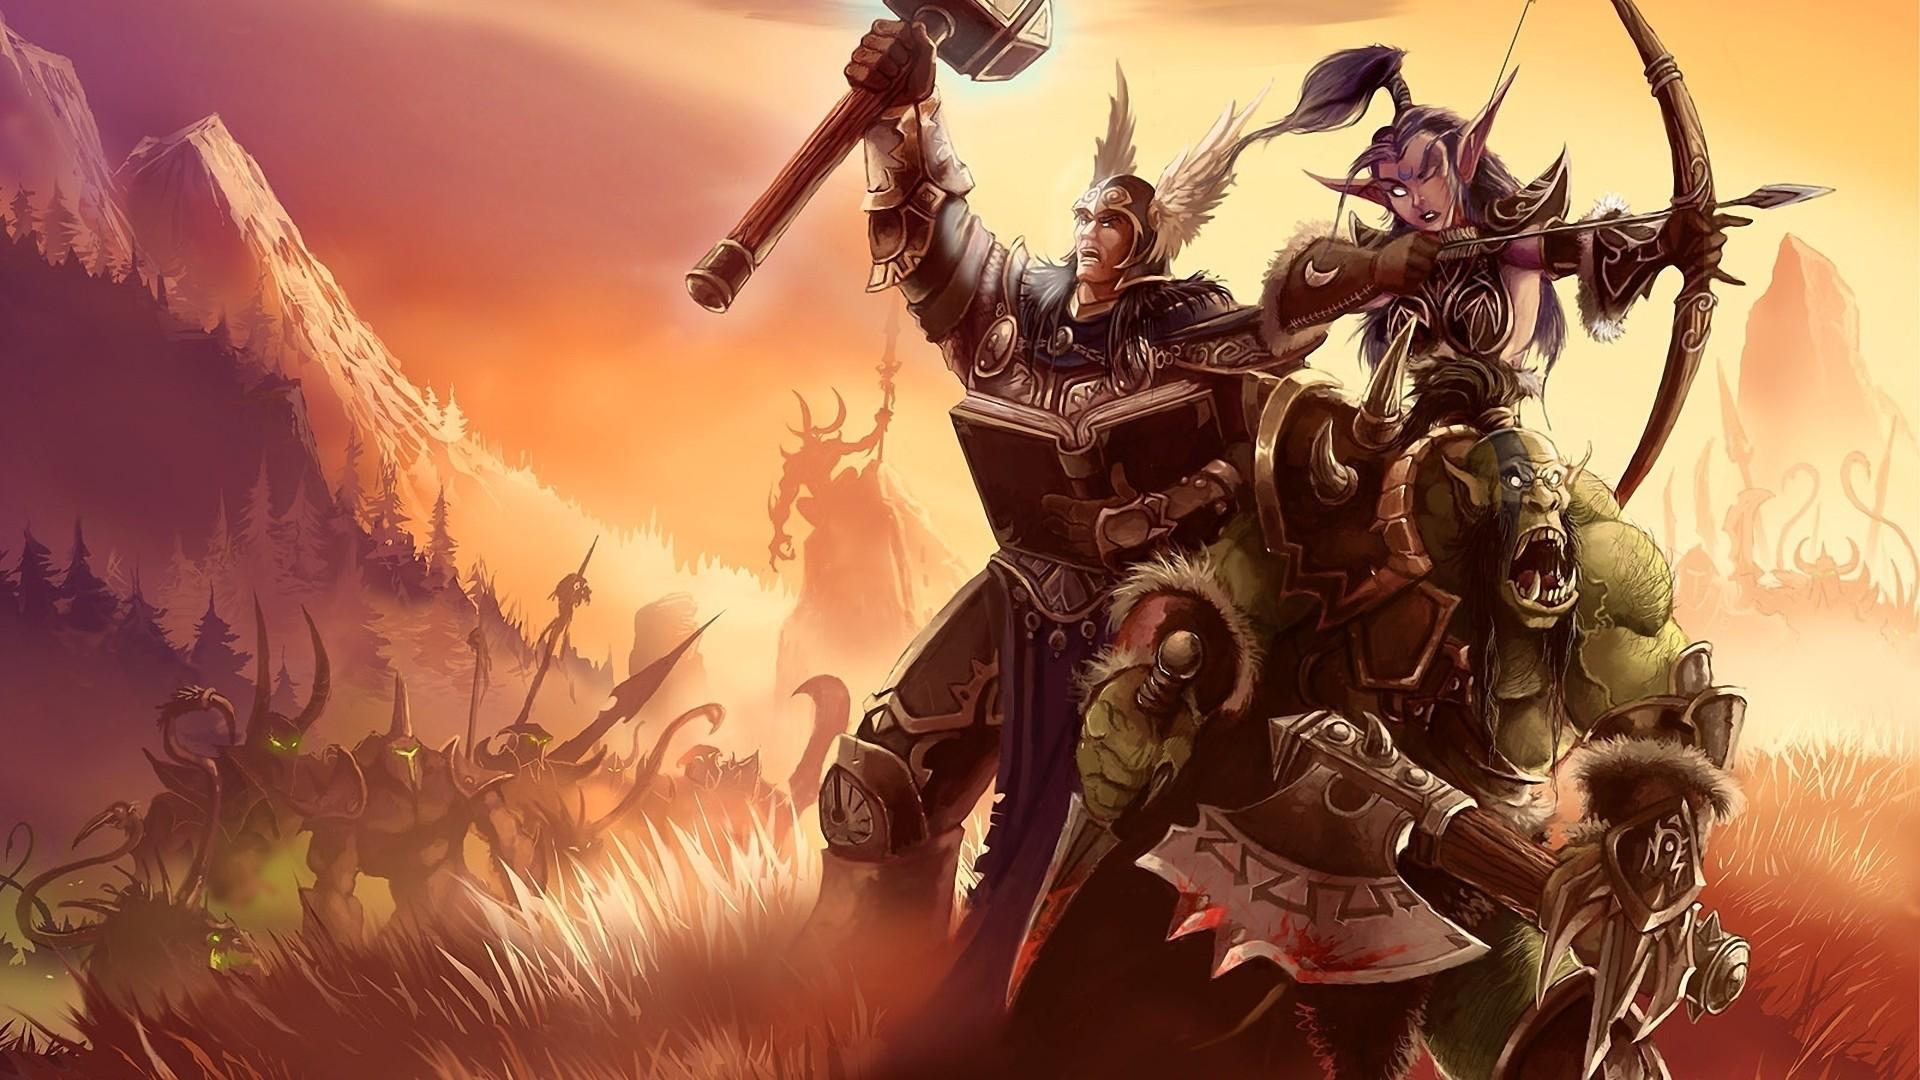 world of warcraft archer warrior berserk art